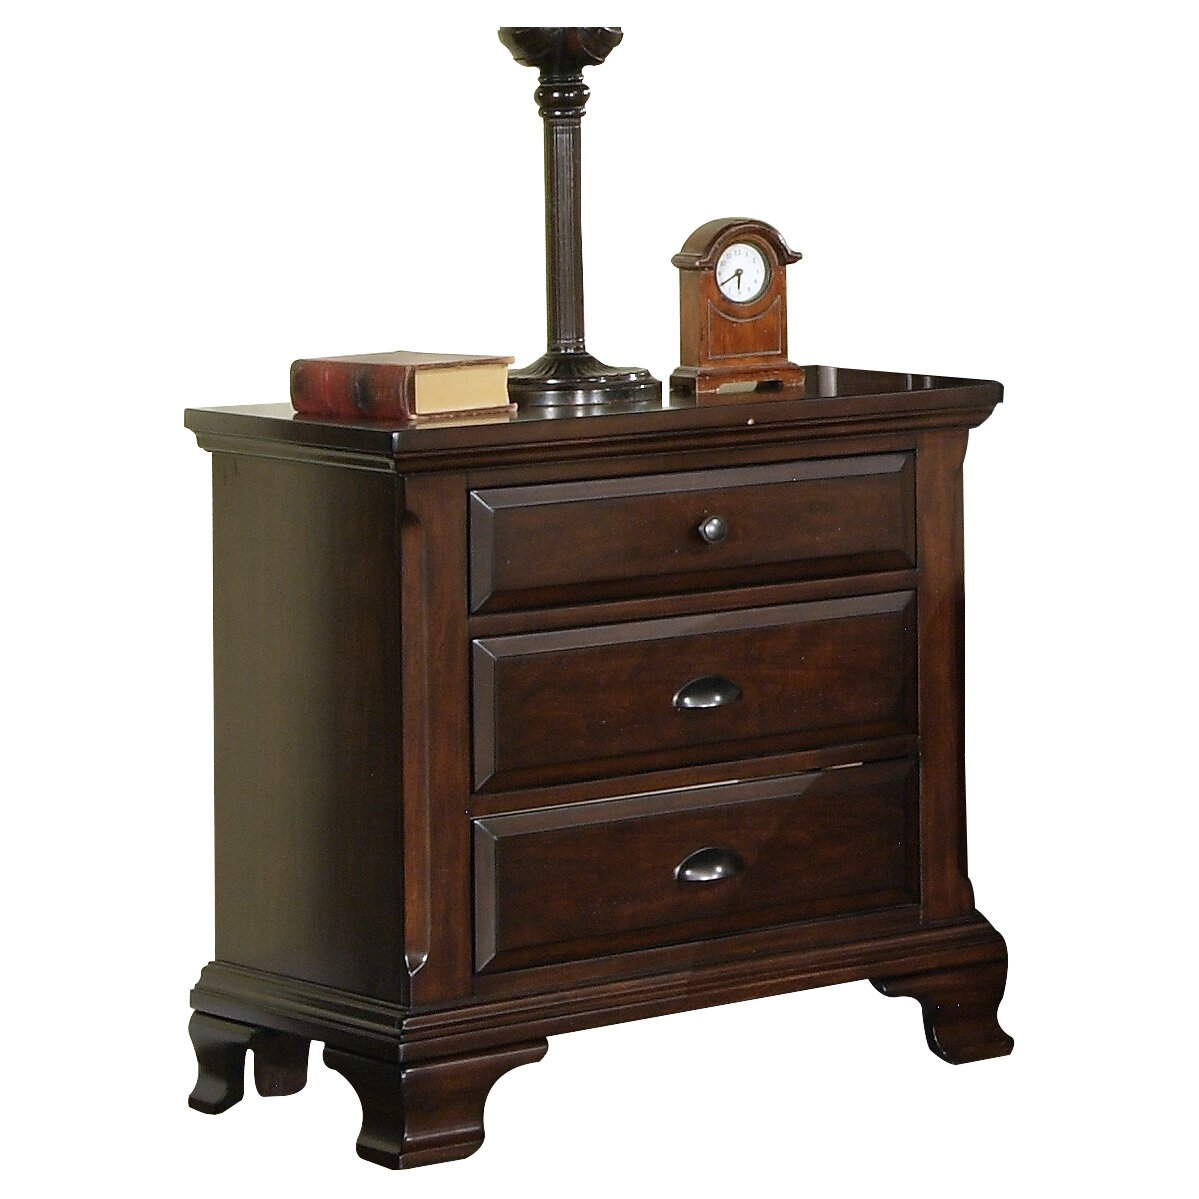 Wayfair Clearance: Picket House Furnishings Grant 3 Drawer Nightstand